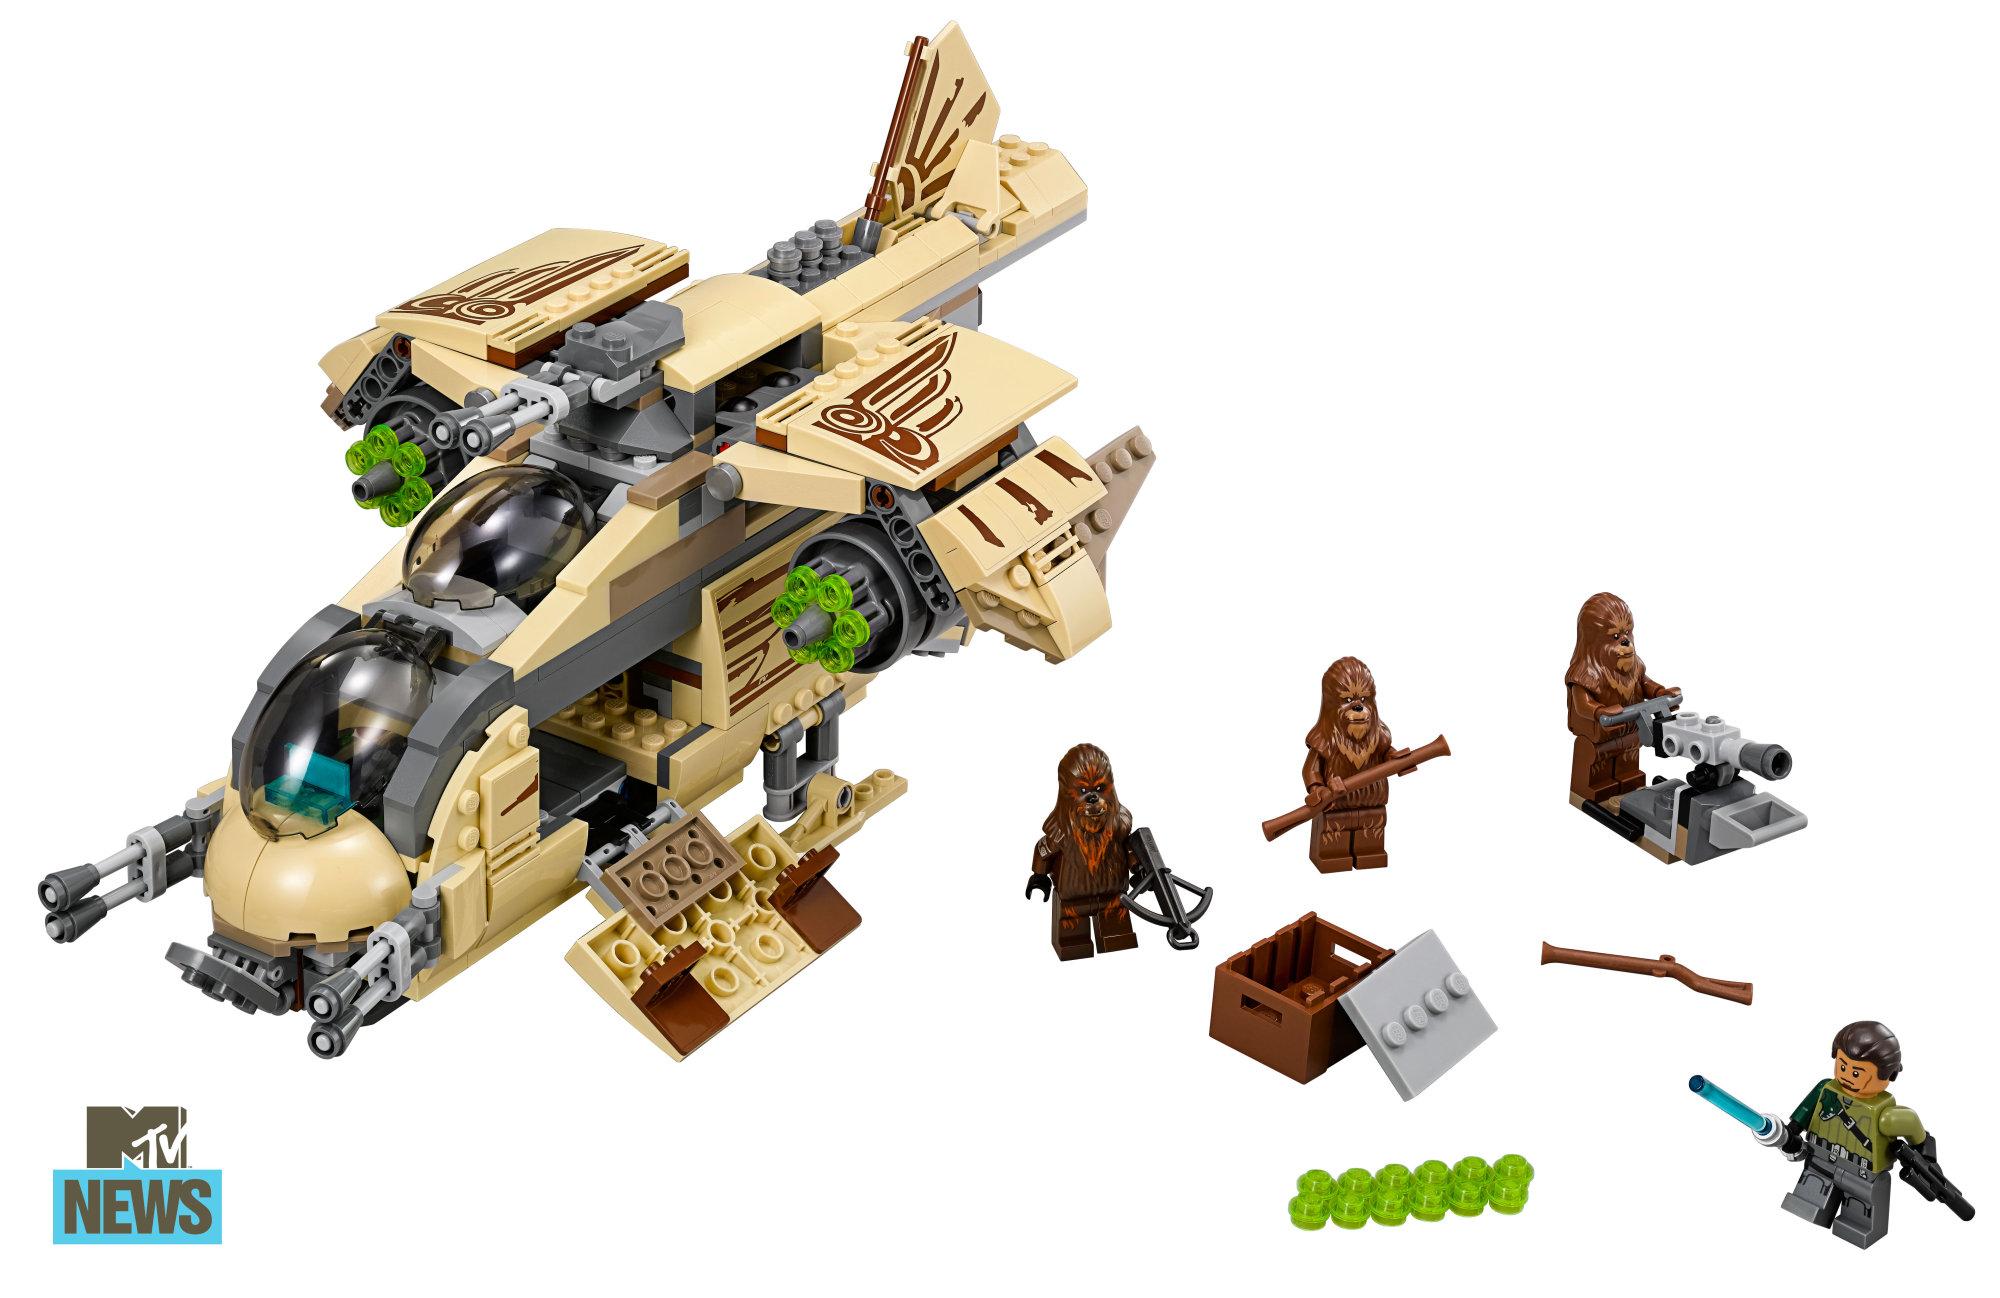 Lego star wars 2015 rumored set list - Lego star warse ...